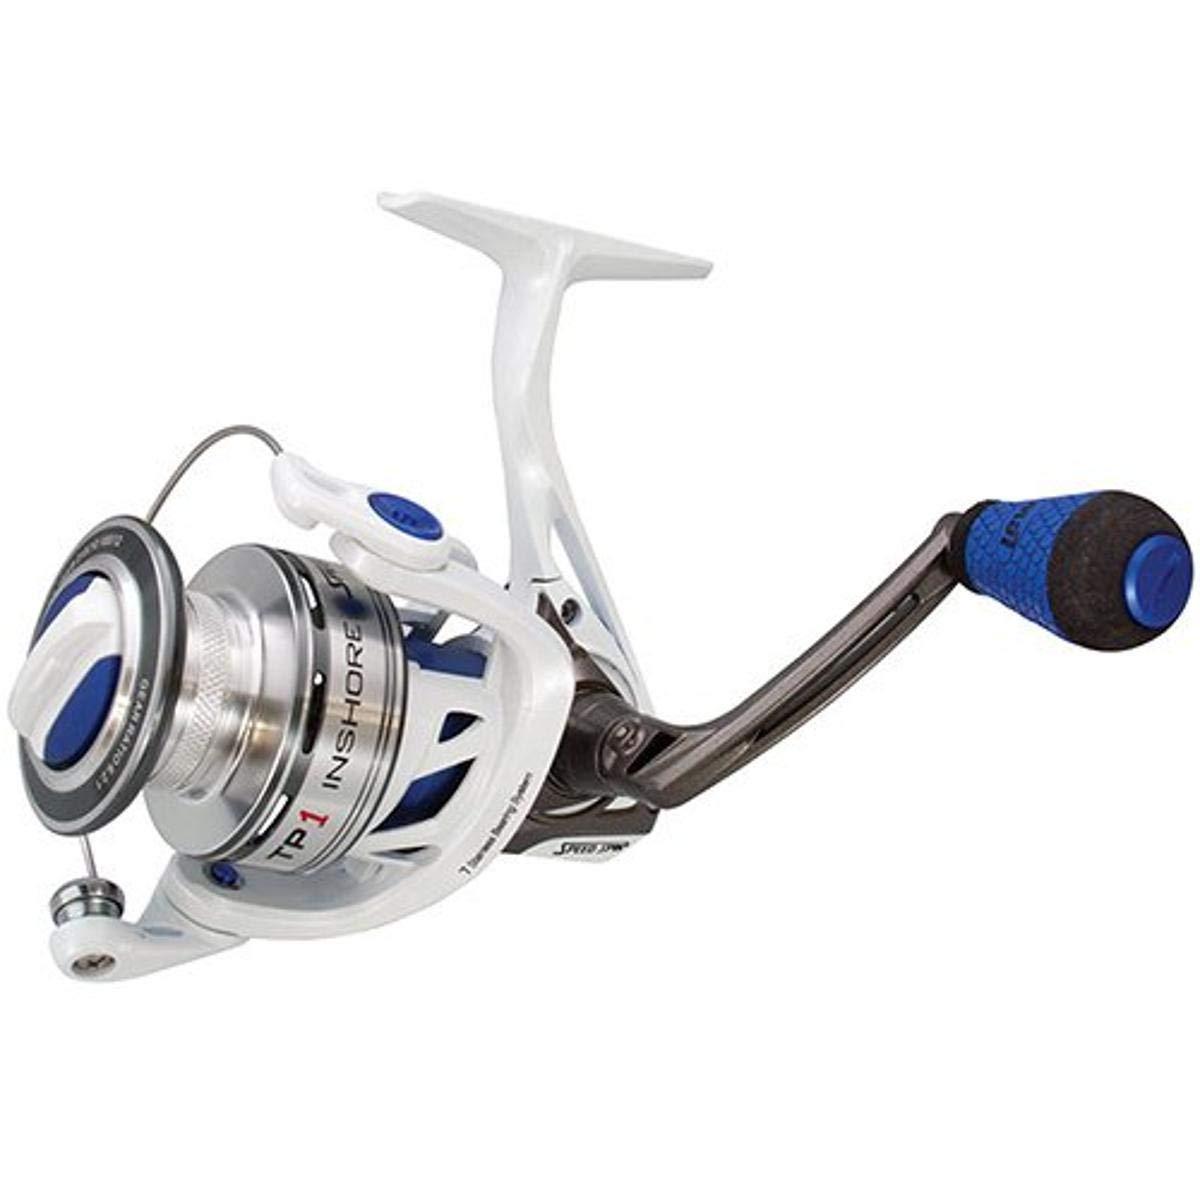 Lews Fishing TPI300 Inshore Spinning Reel